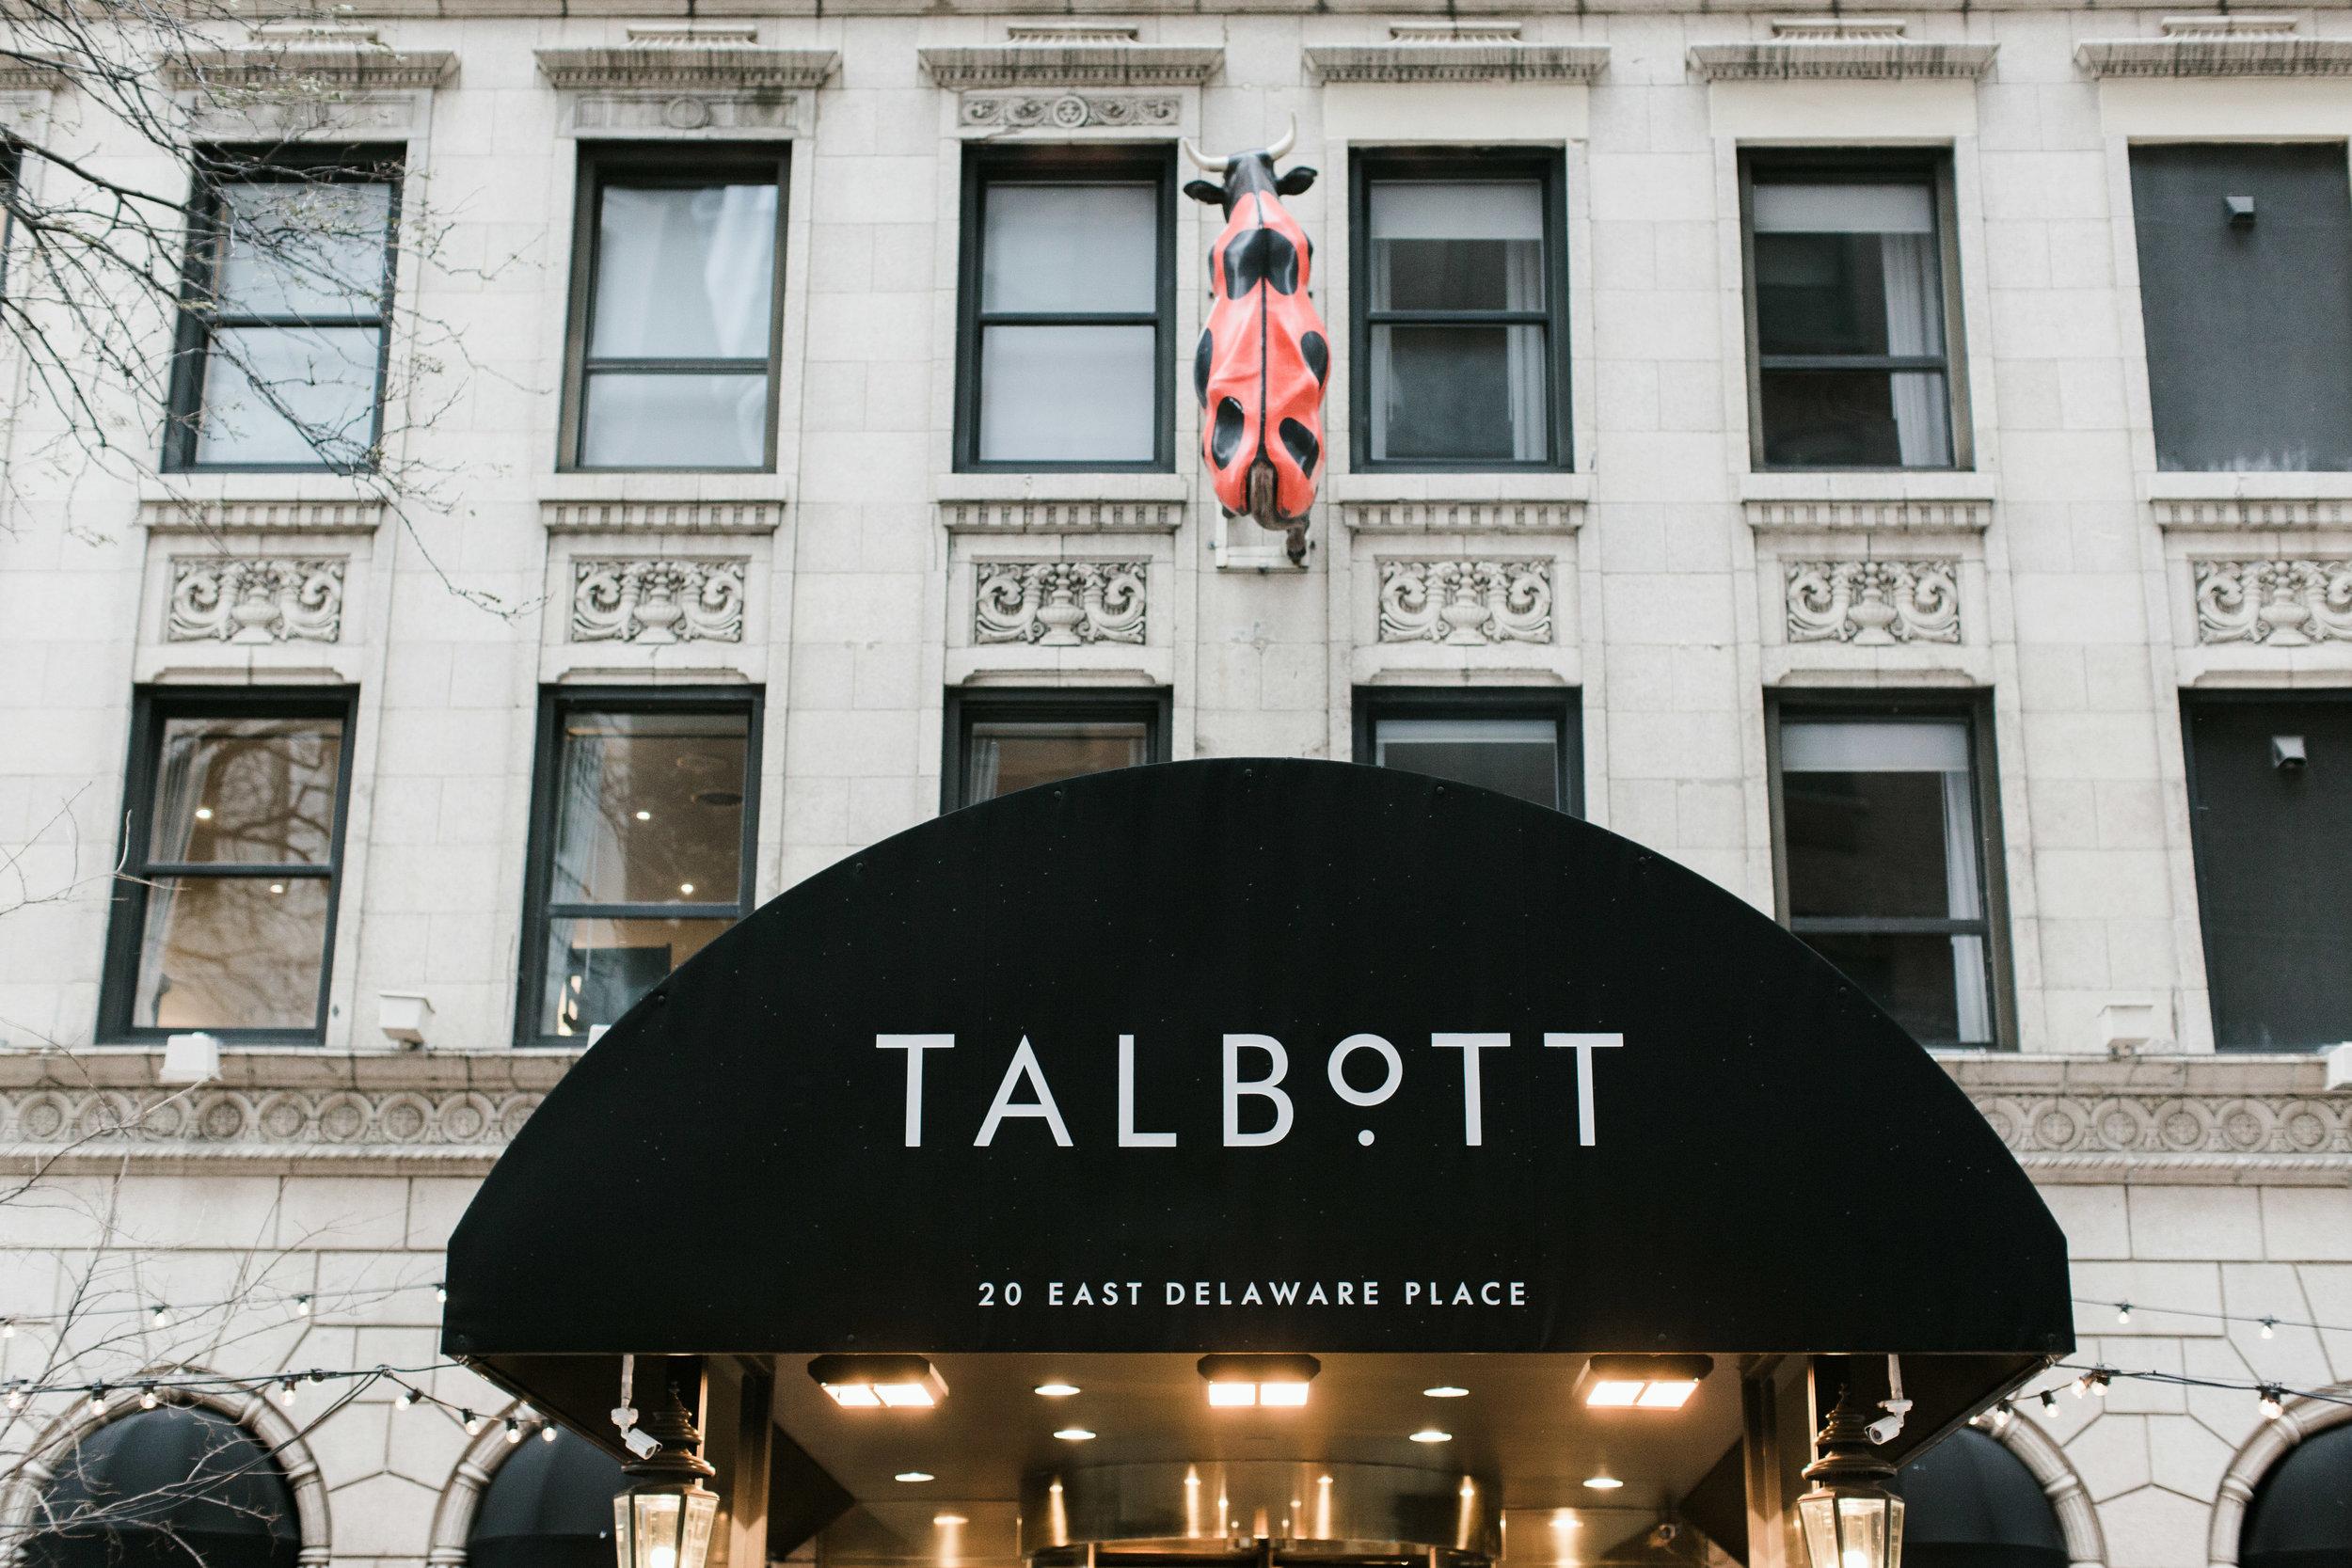 talbott-casino-club-1.jpg